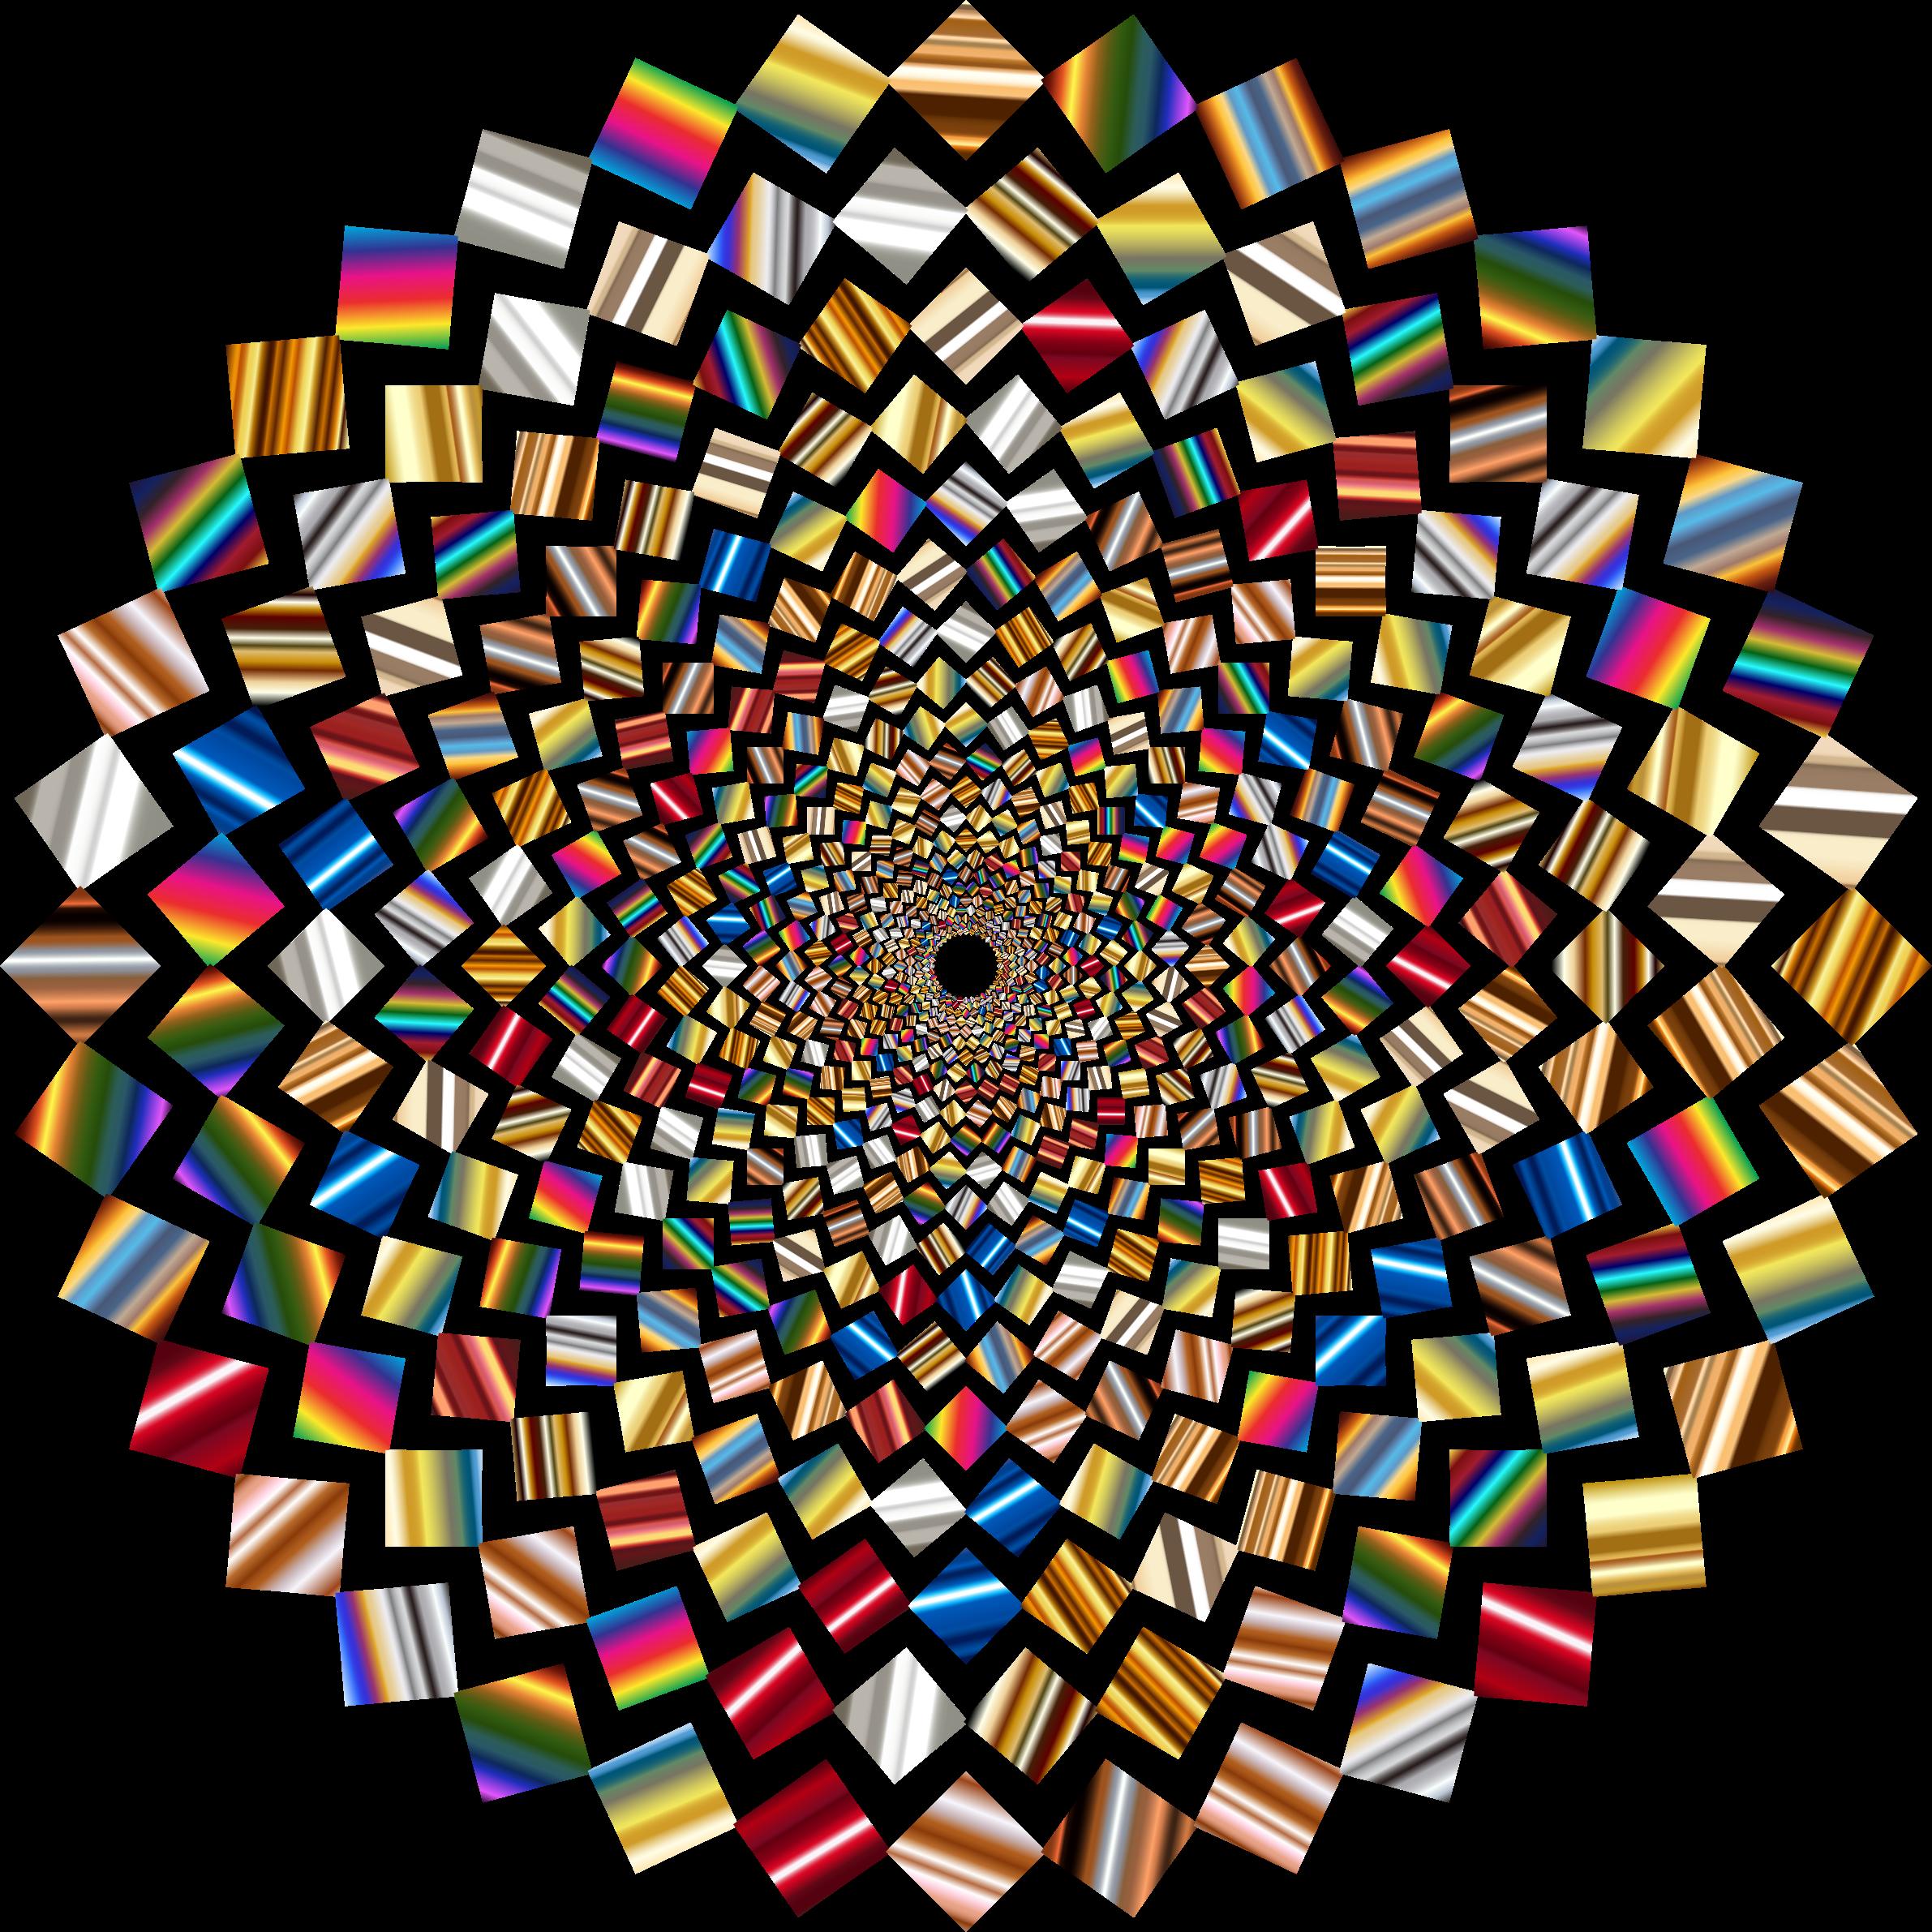 Physcedelic clipart transparent Clipart Concentric Psychedelic Colorful Vortex